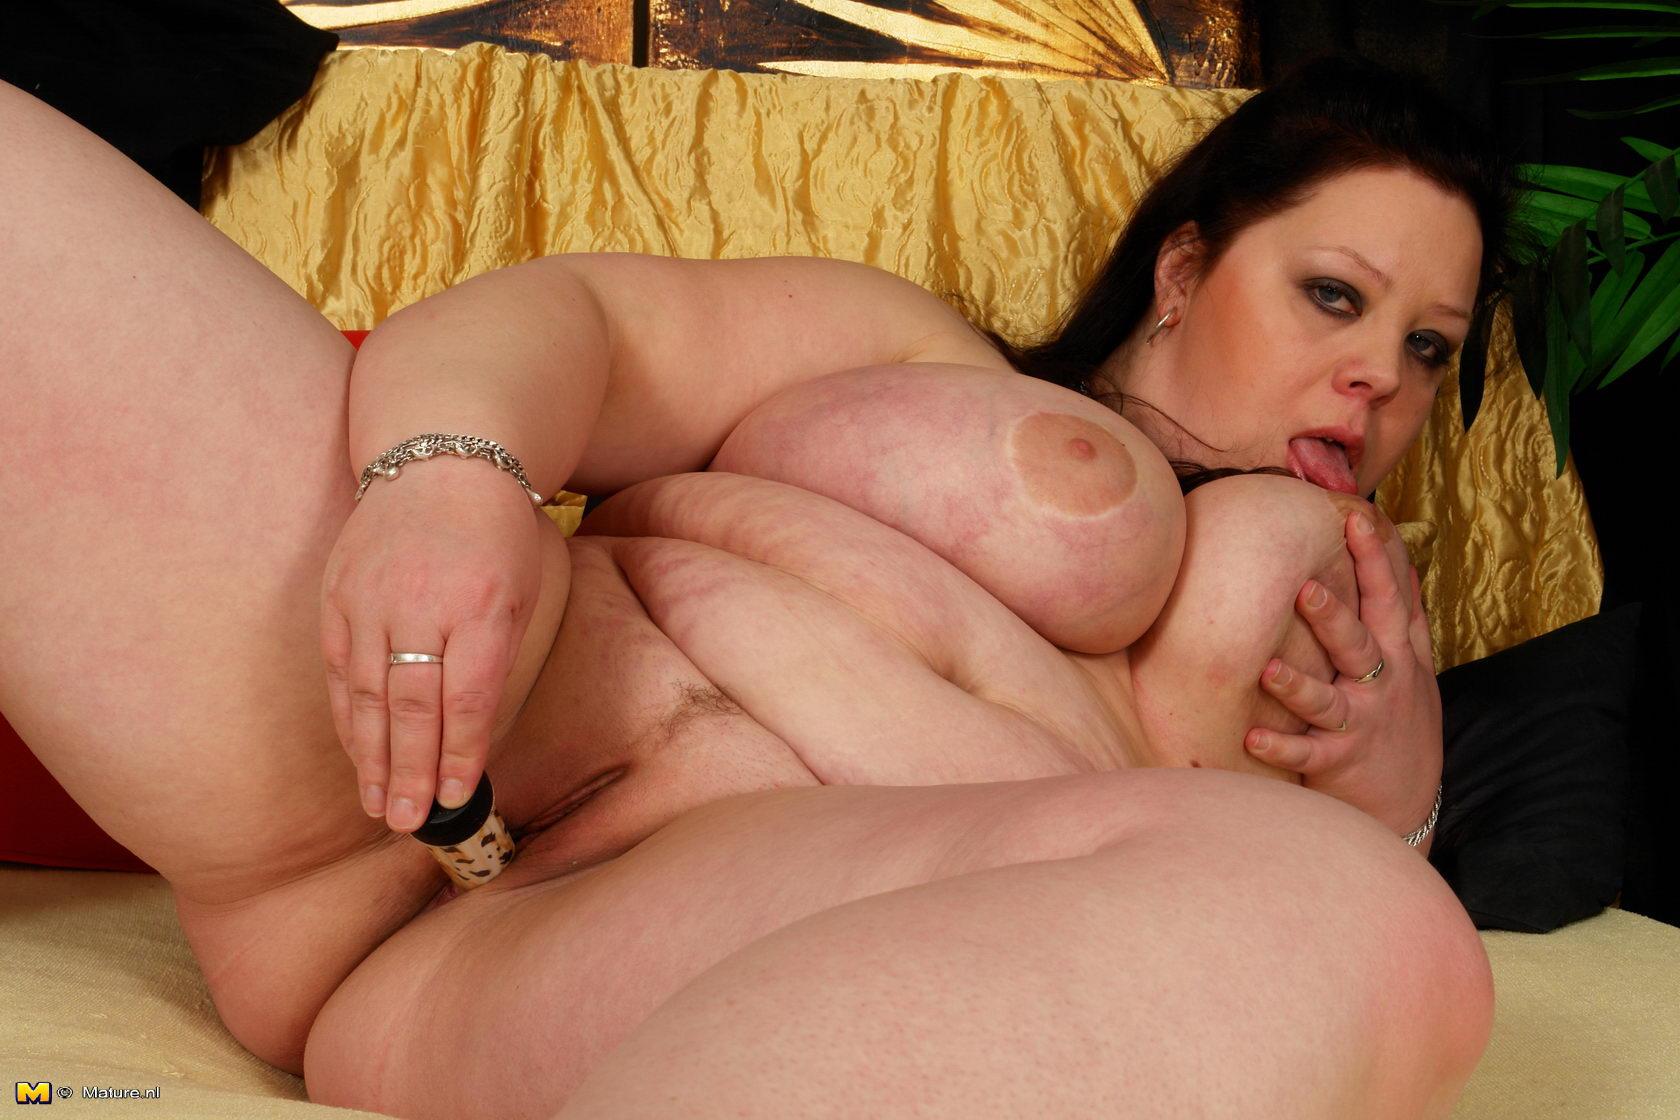 Big breasted mature slut going wild 3